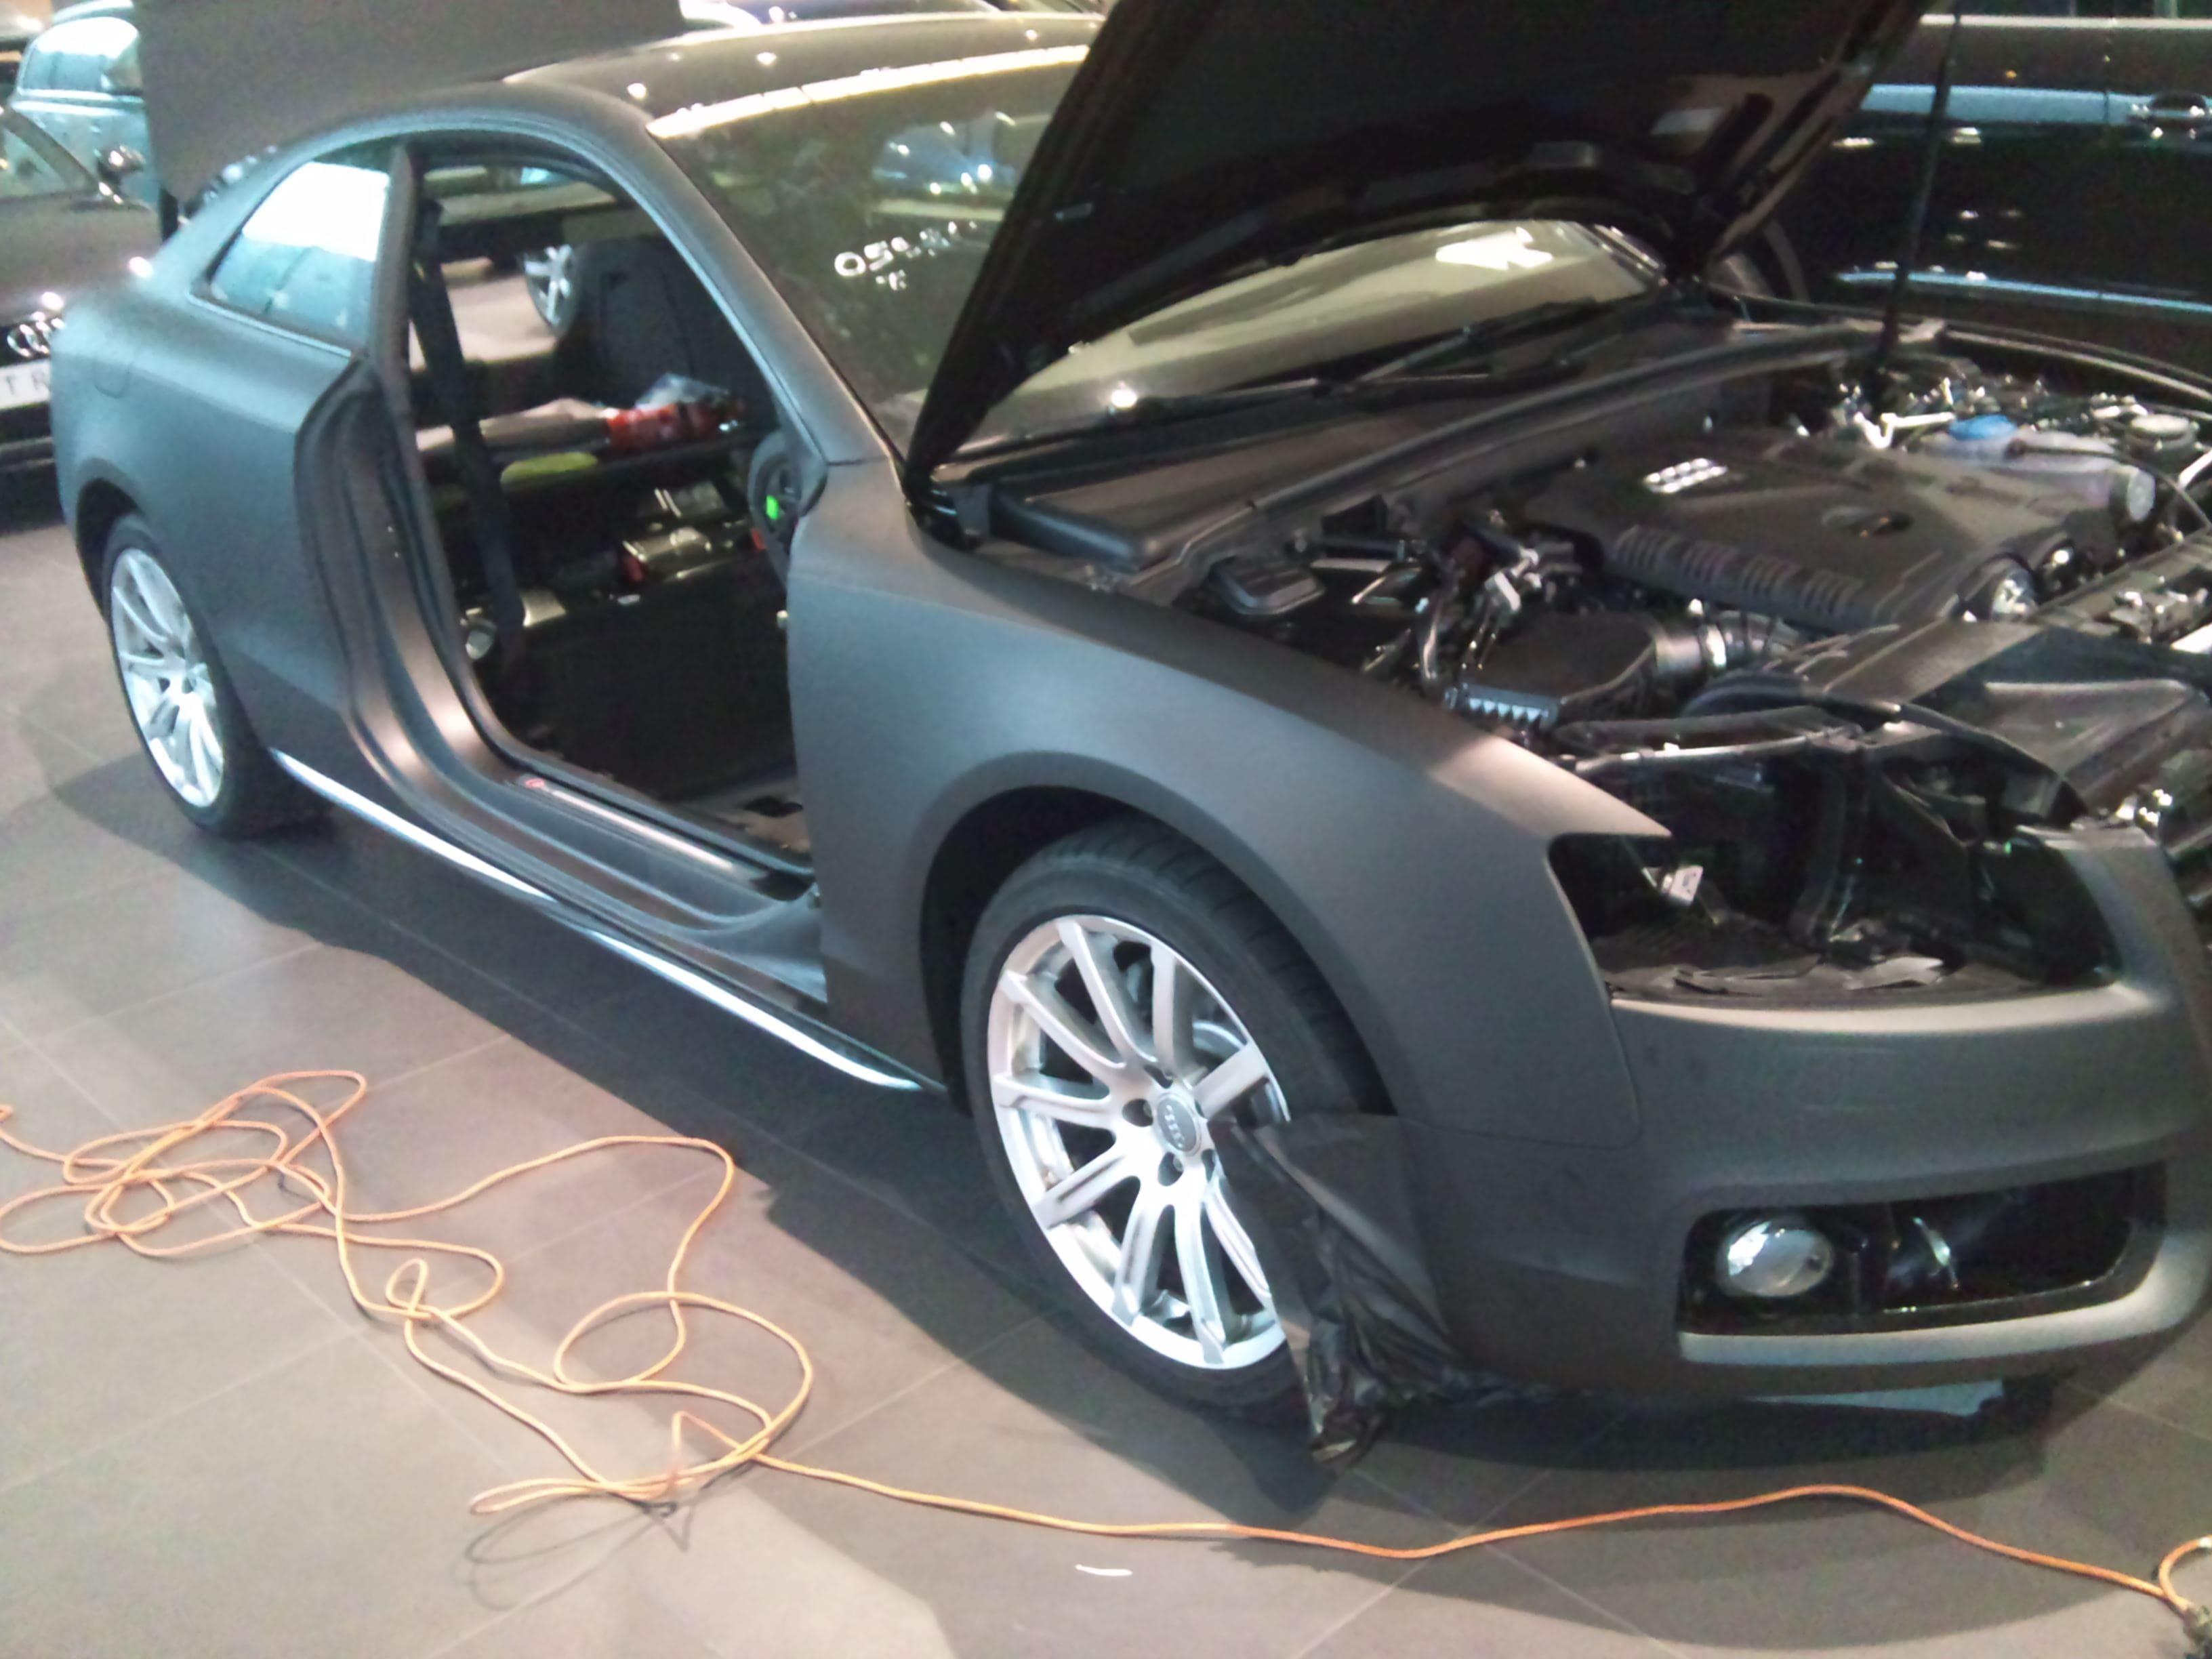 Audi A5 Coupe met Mat Zwarte Wrap, Carwrapping door Wrapmyride.nu Foto-nr:4553, ©2021